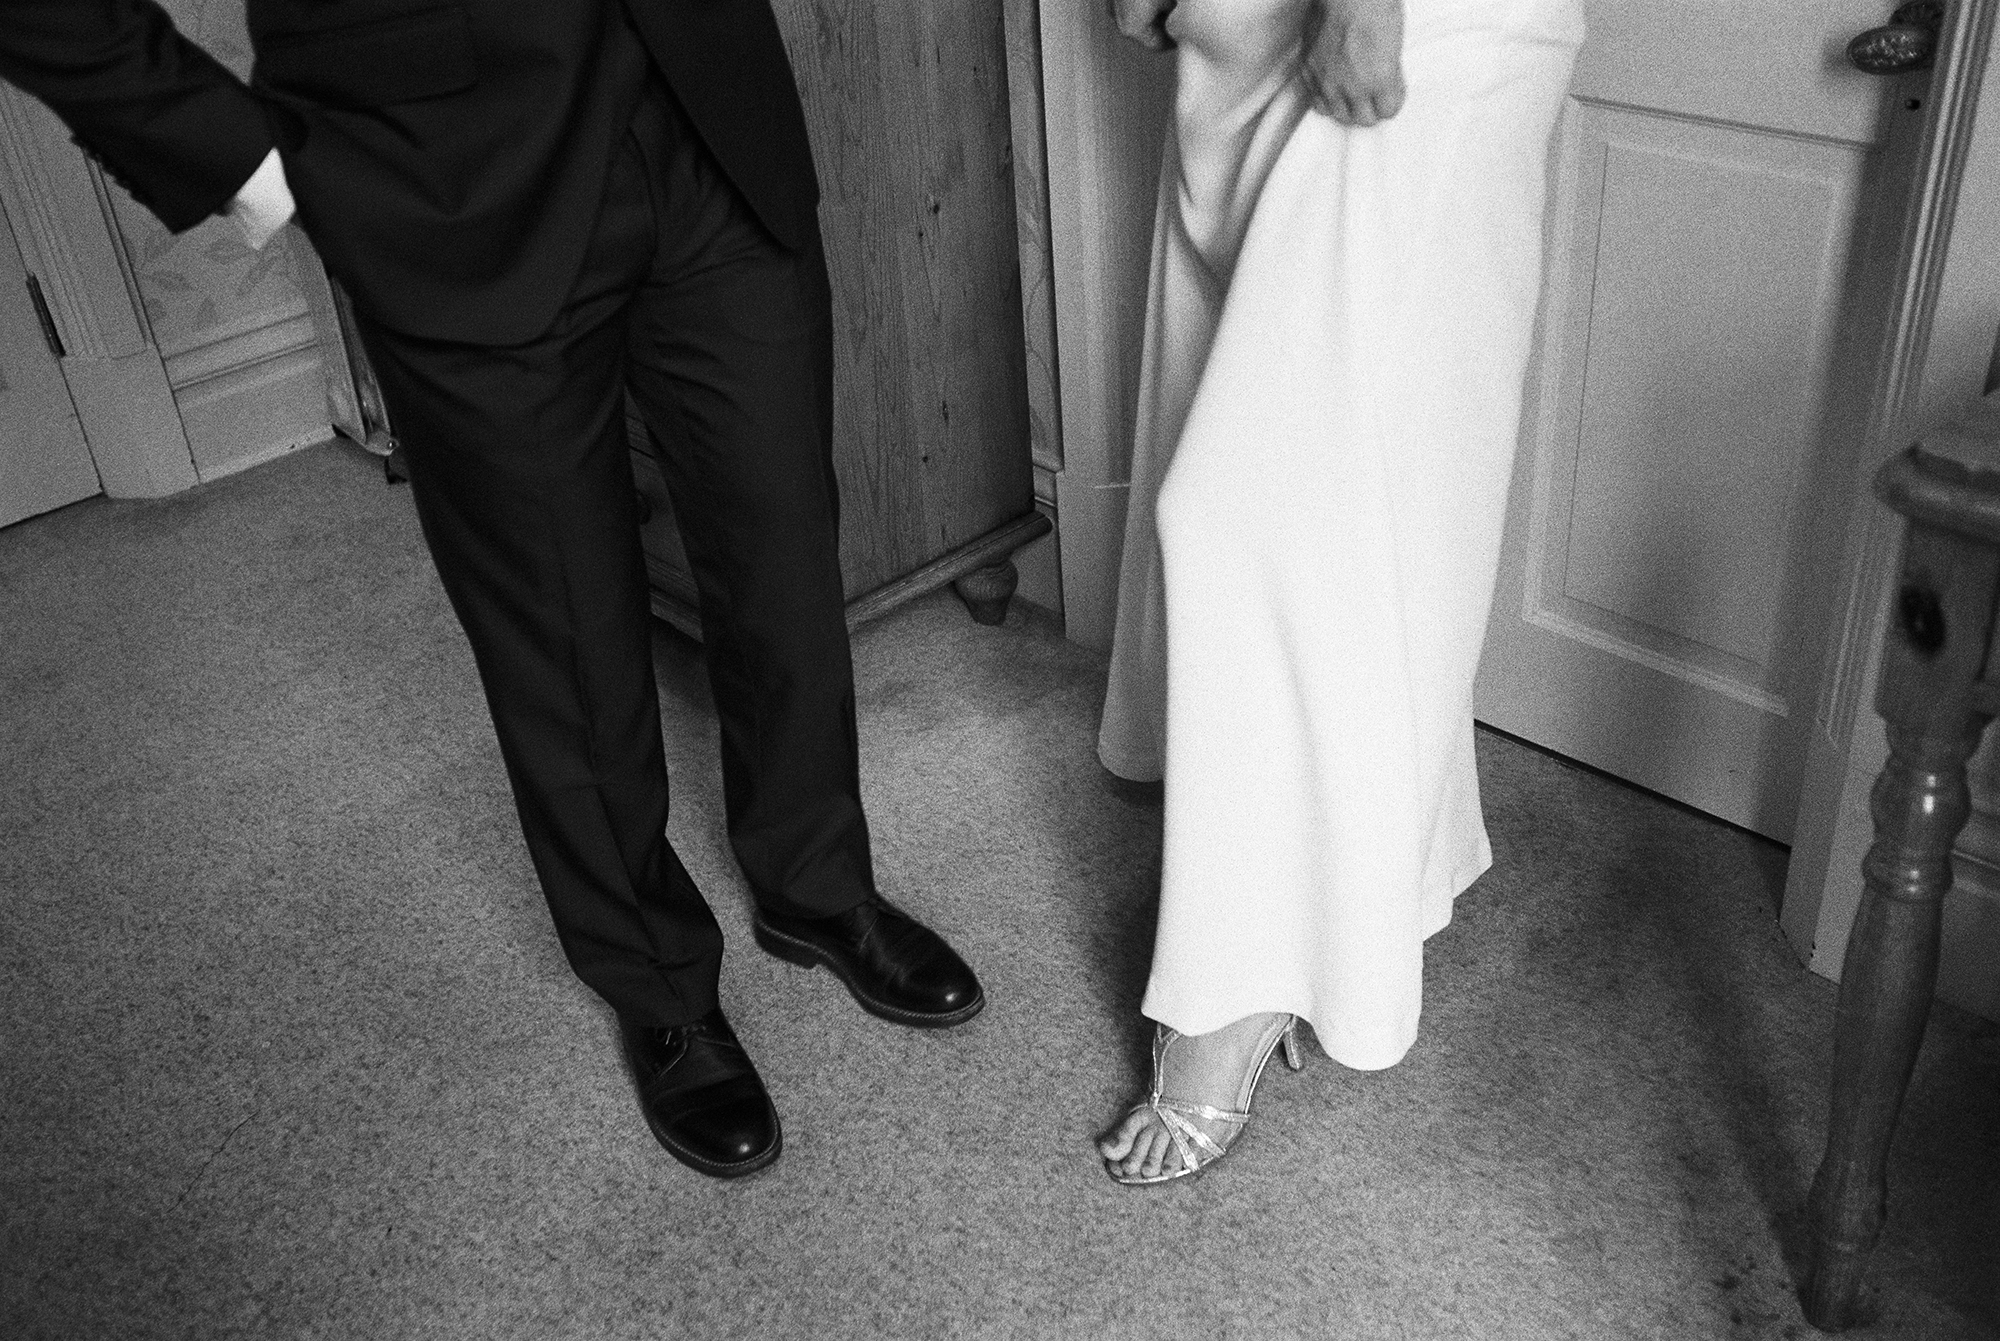 wedding_photographer_cumbria017.jpg